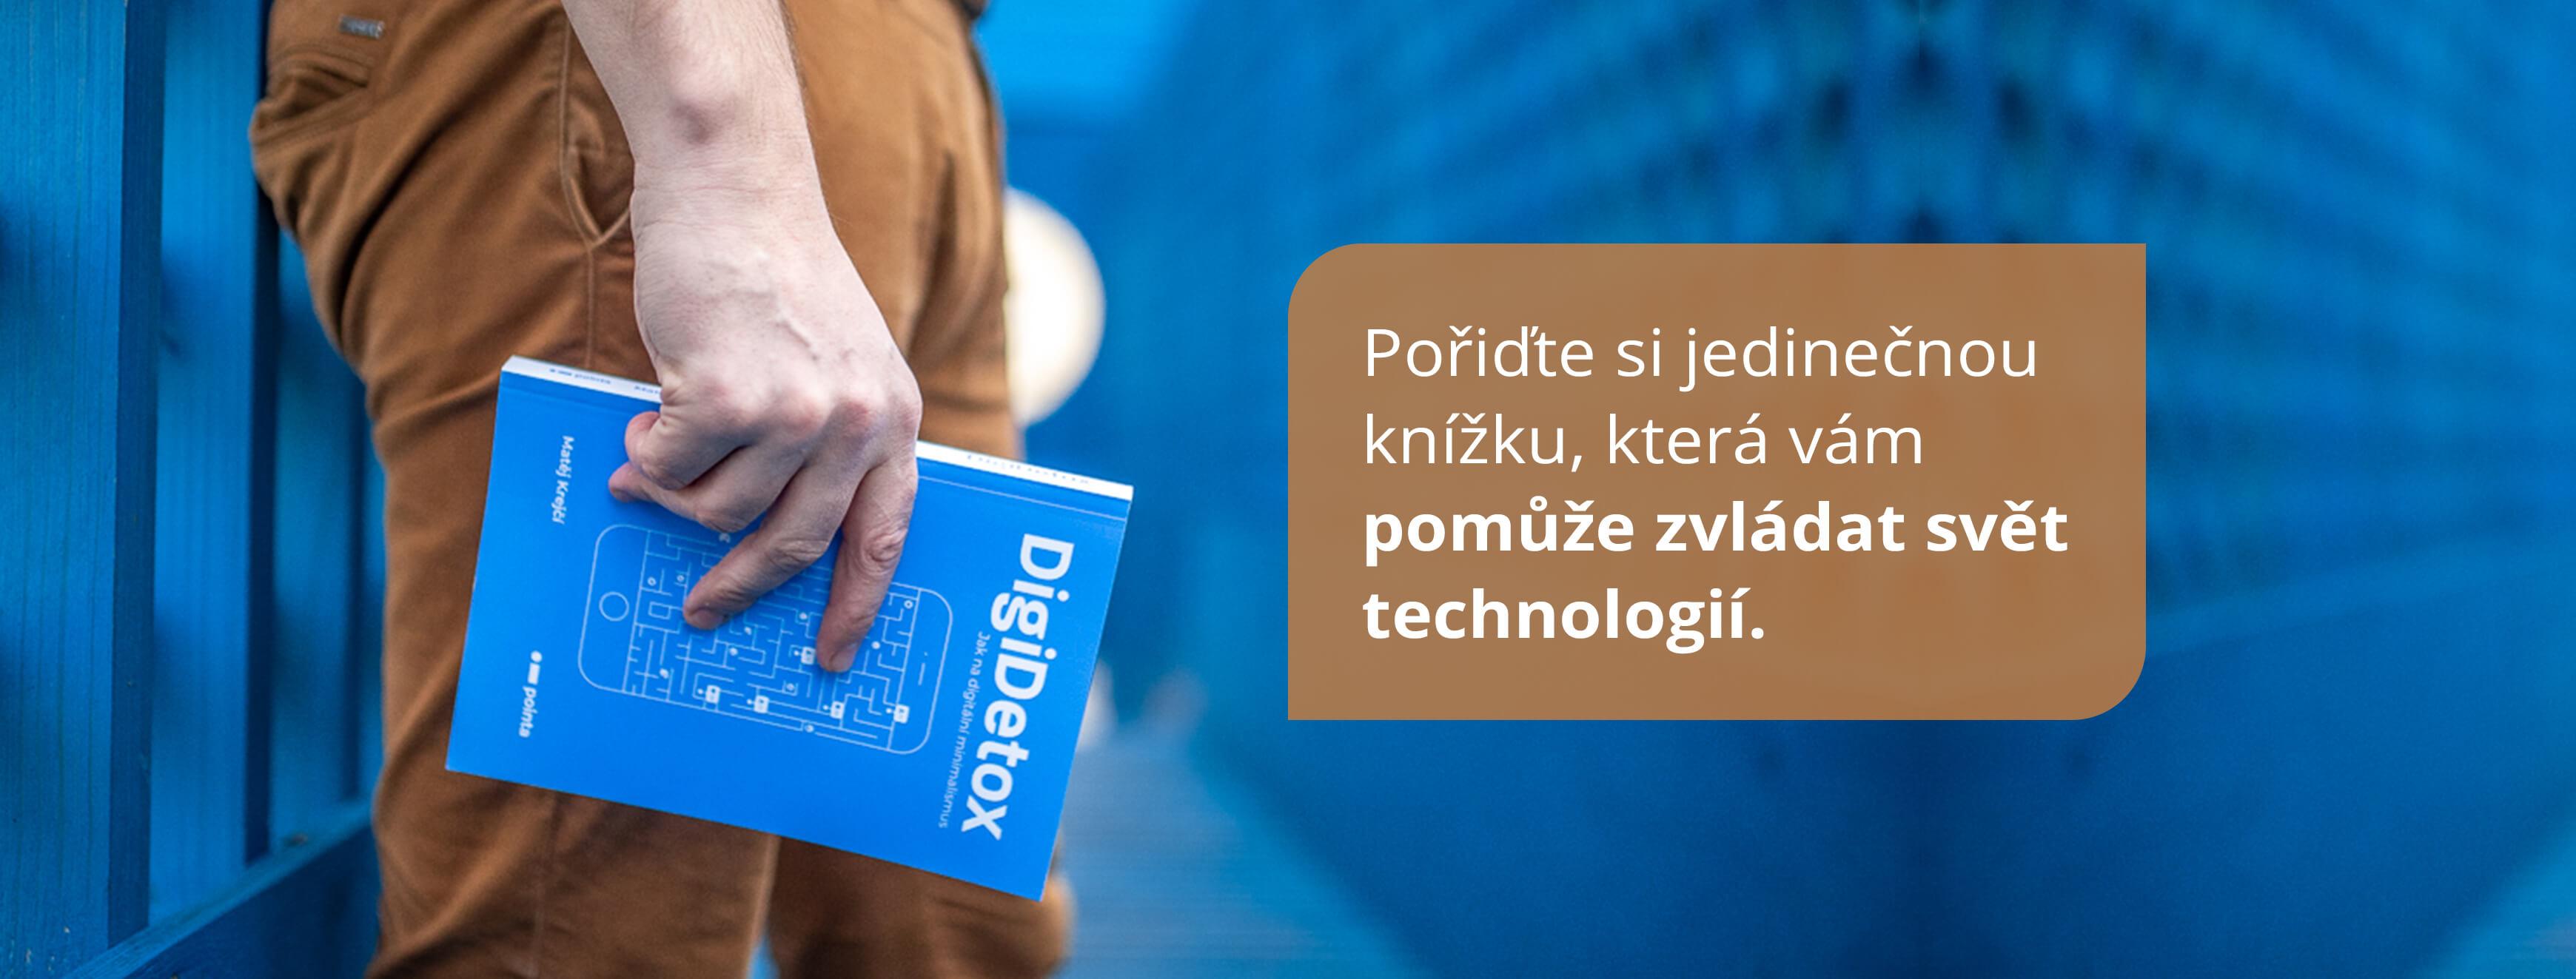 Kniha Digidetox - jak na digitální minimalismus